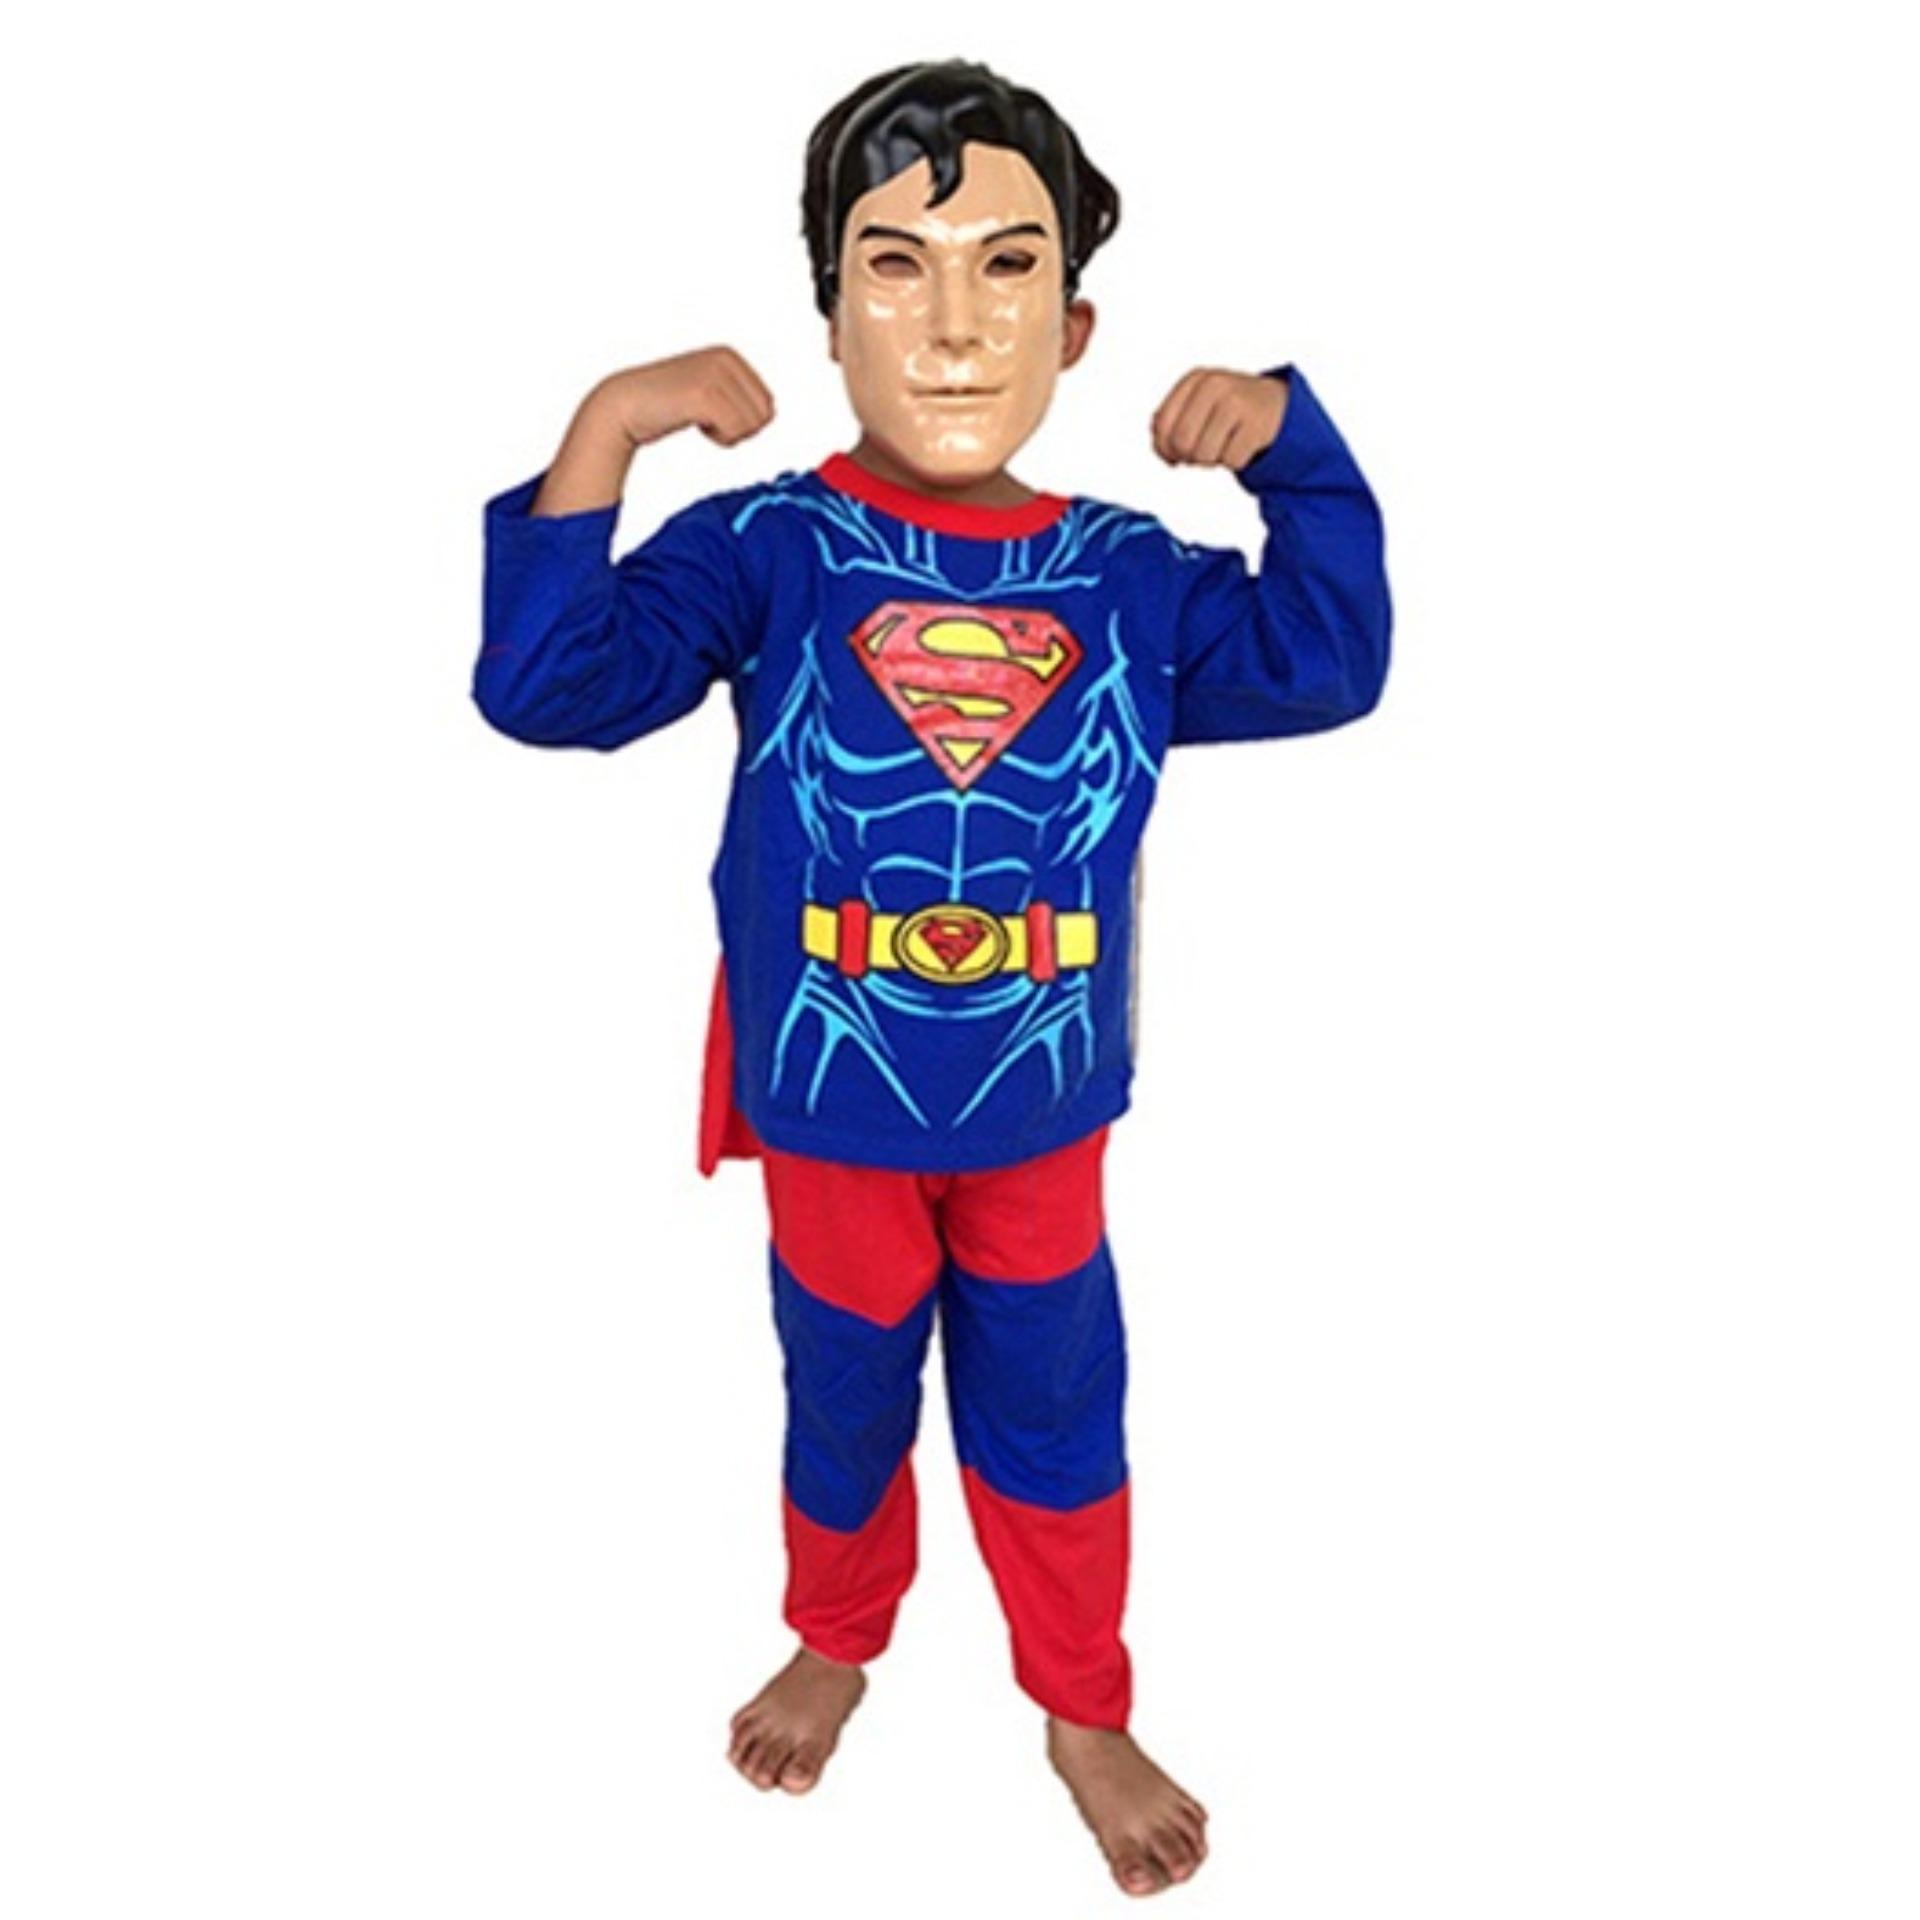 Baju Anak Kostum Topeng Superhero Superman Super Man